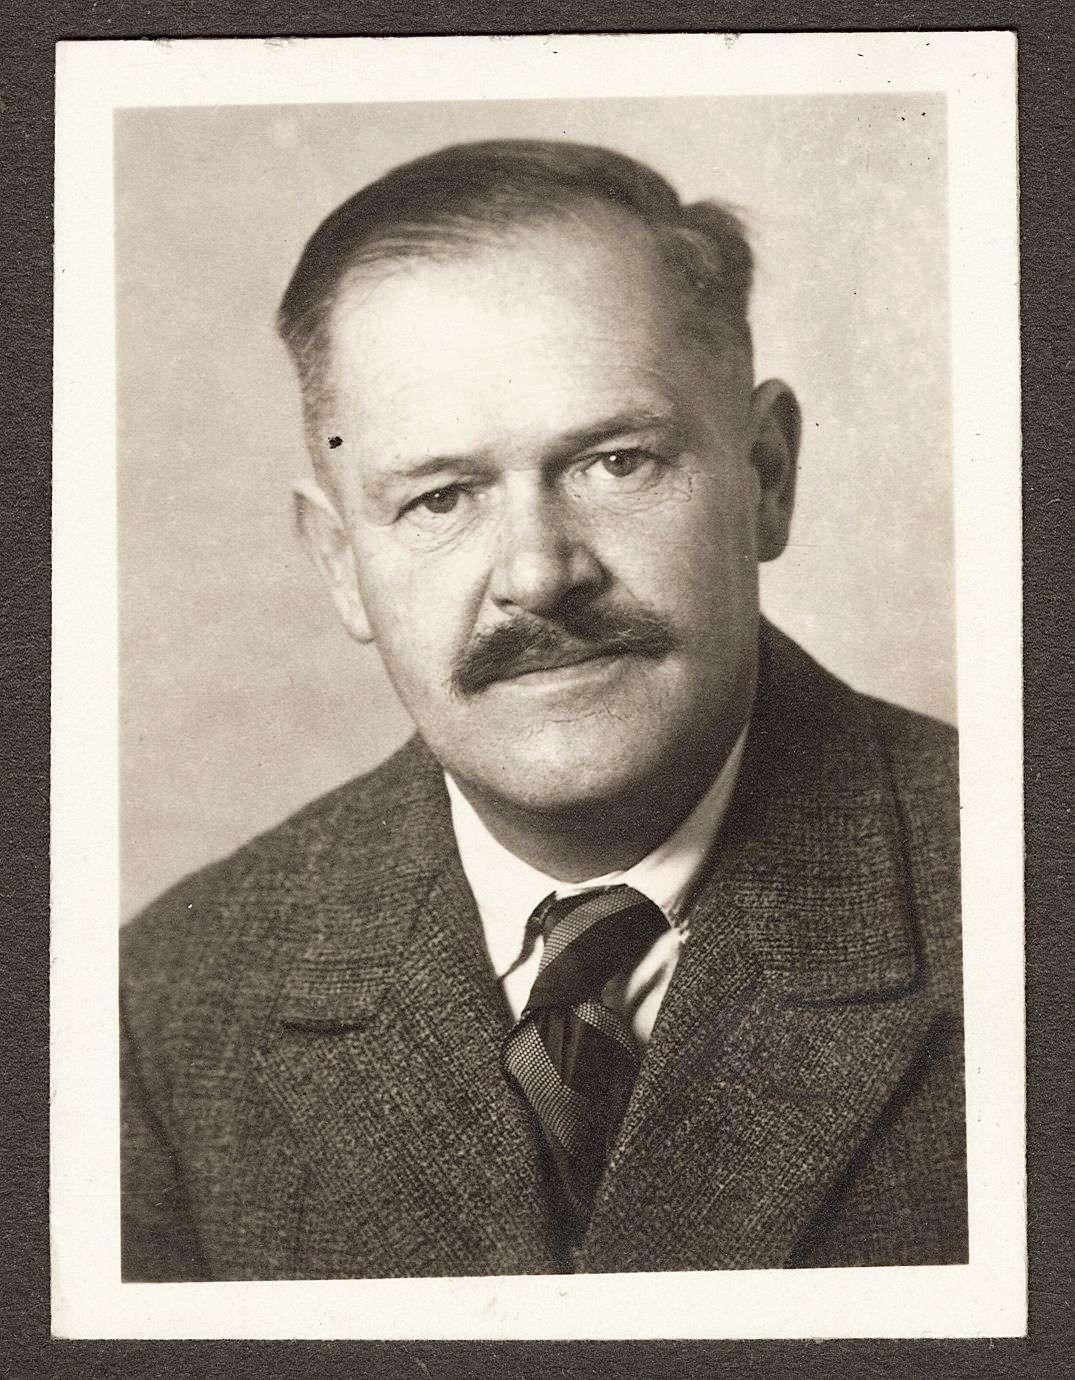 Kerlein, Karl, Bild 1